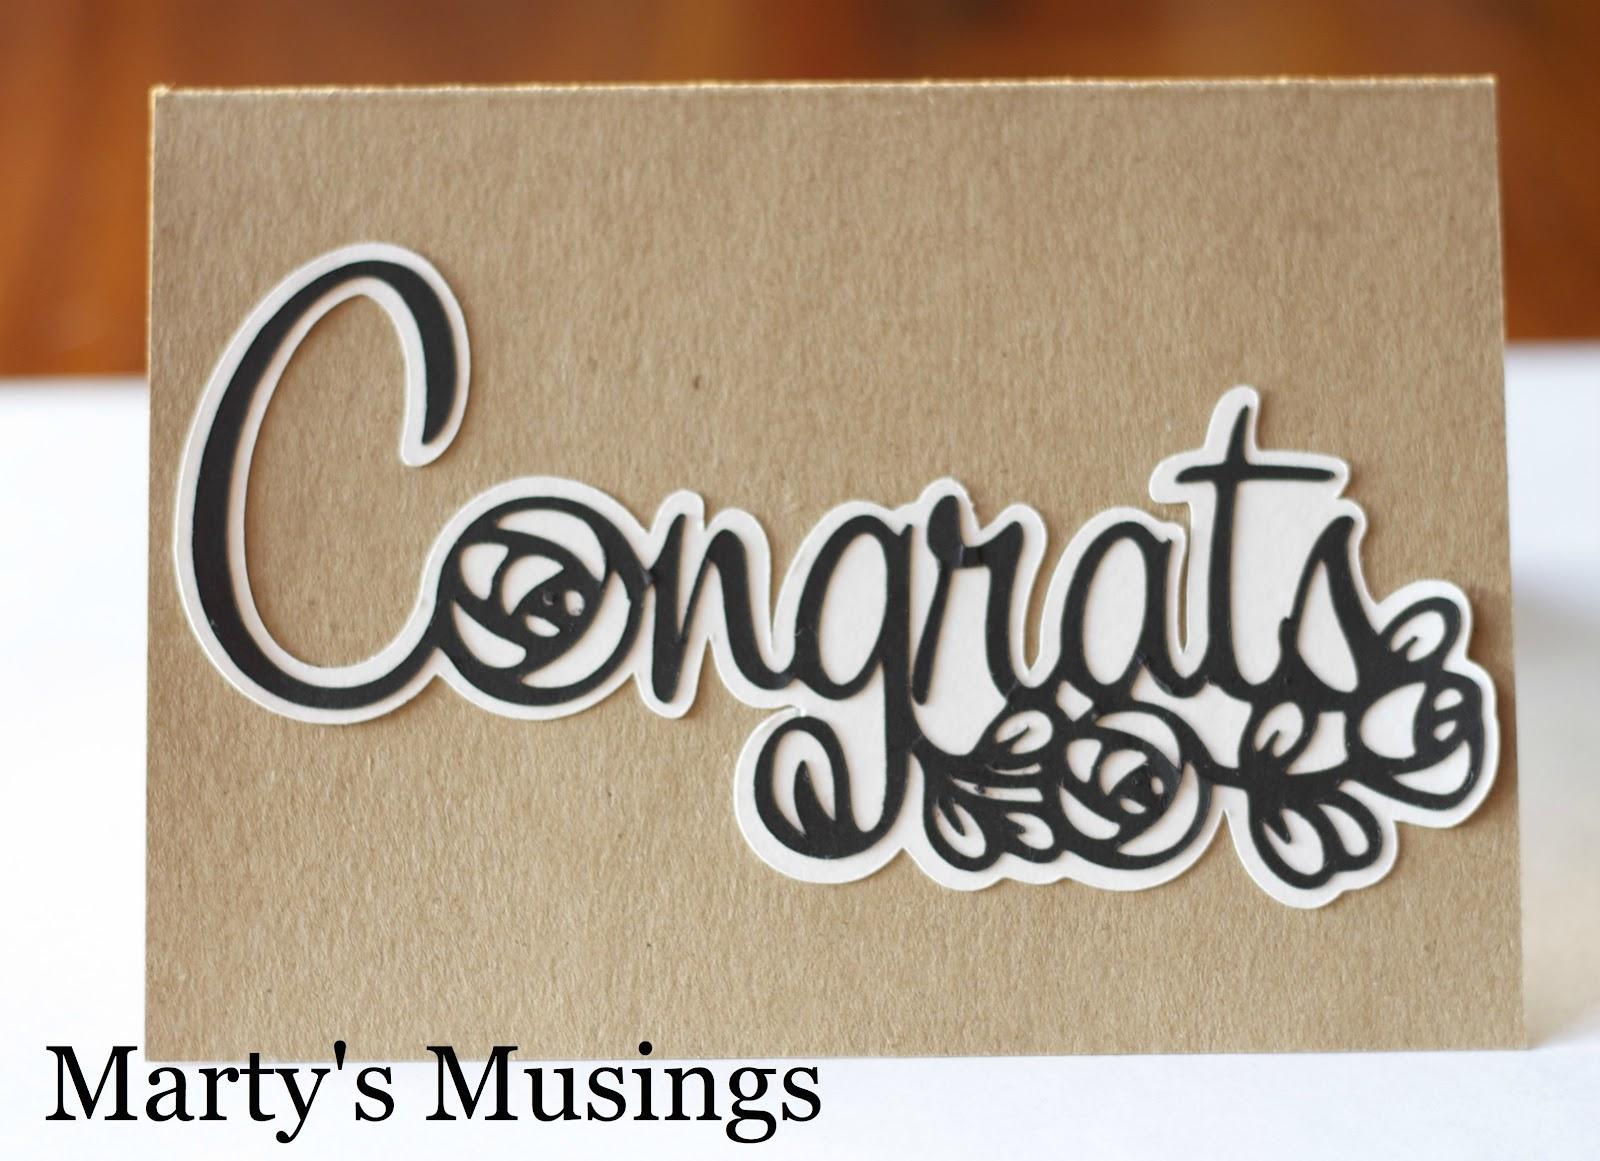 Congrats Graduation Card Marty S Musings